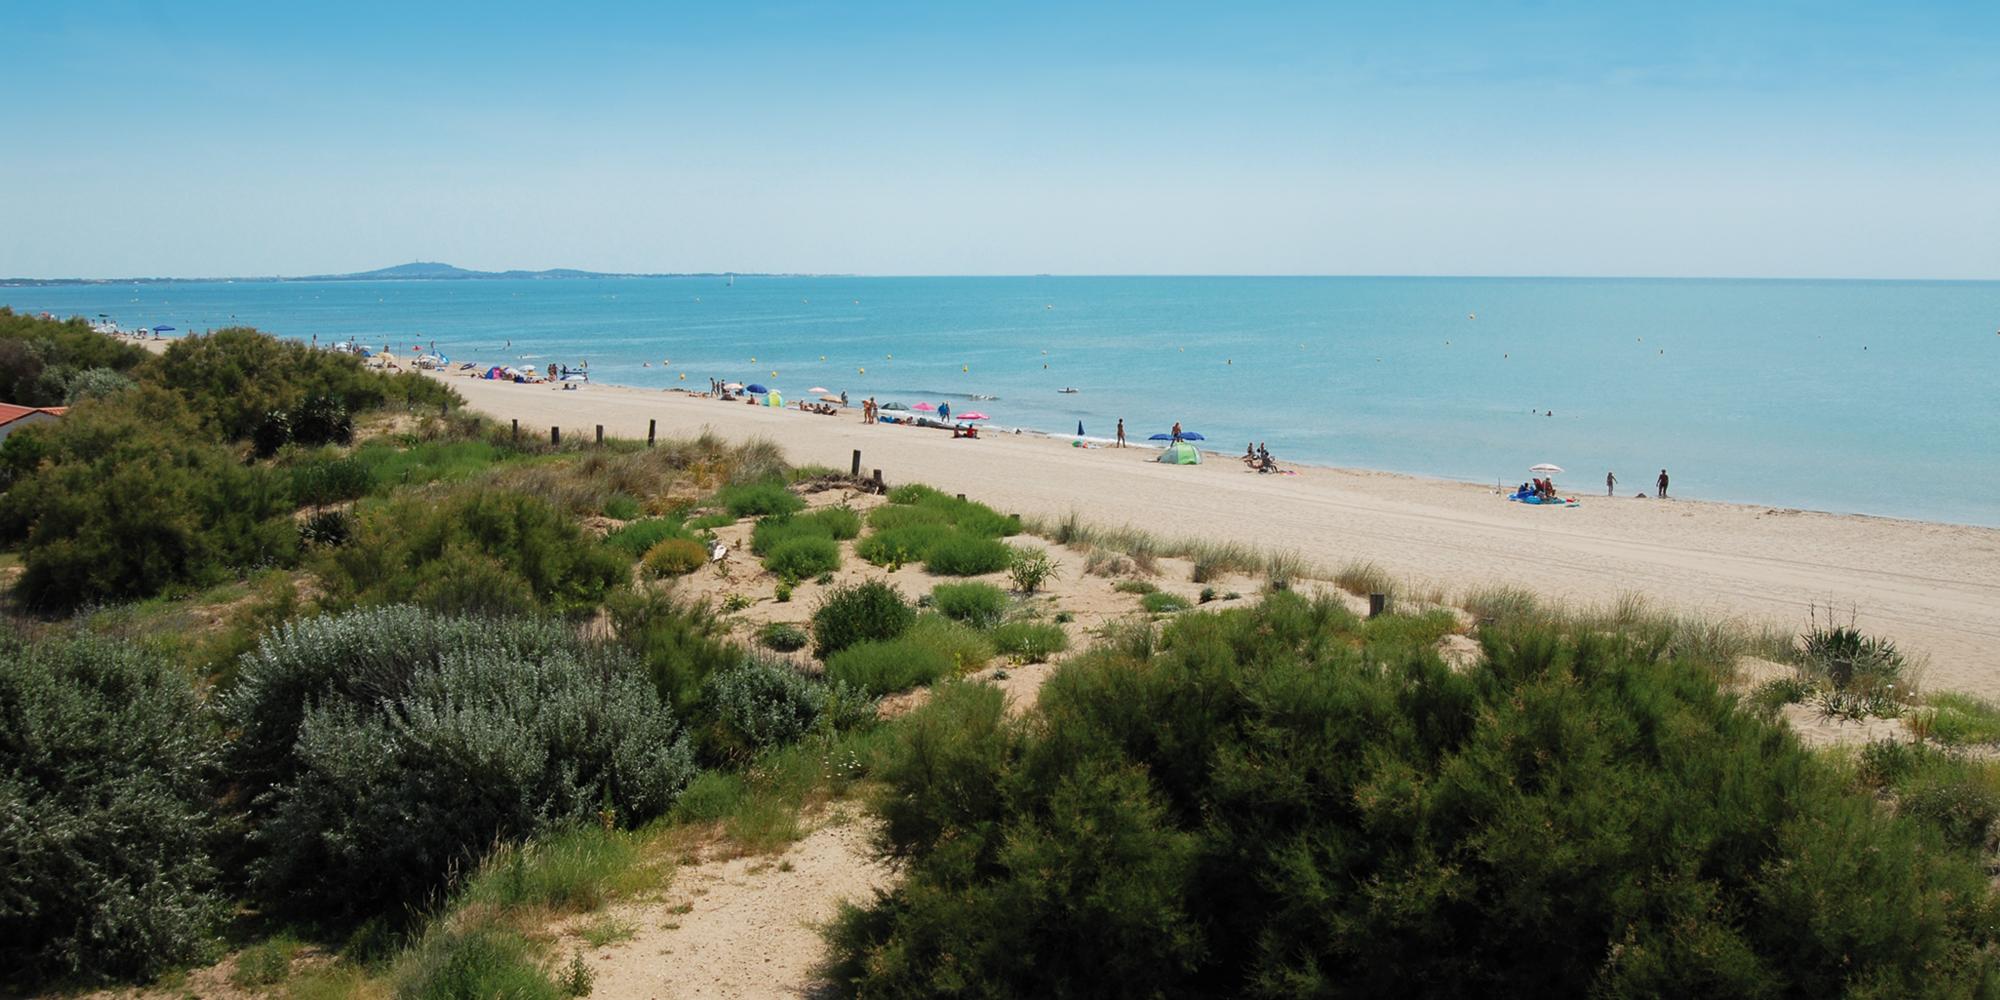 Camping en bord de mer d couvrez le camping beaus jour for Camping 5 etoiles var bord de mer avec piscine